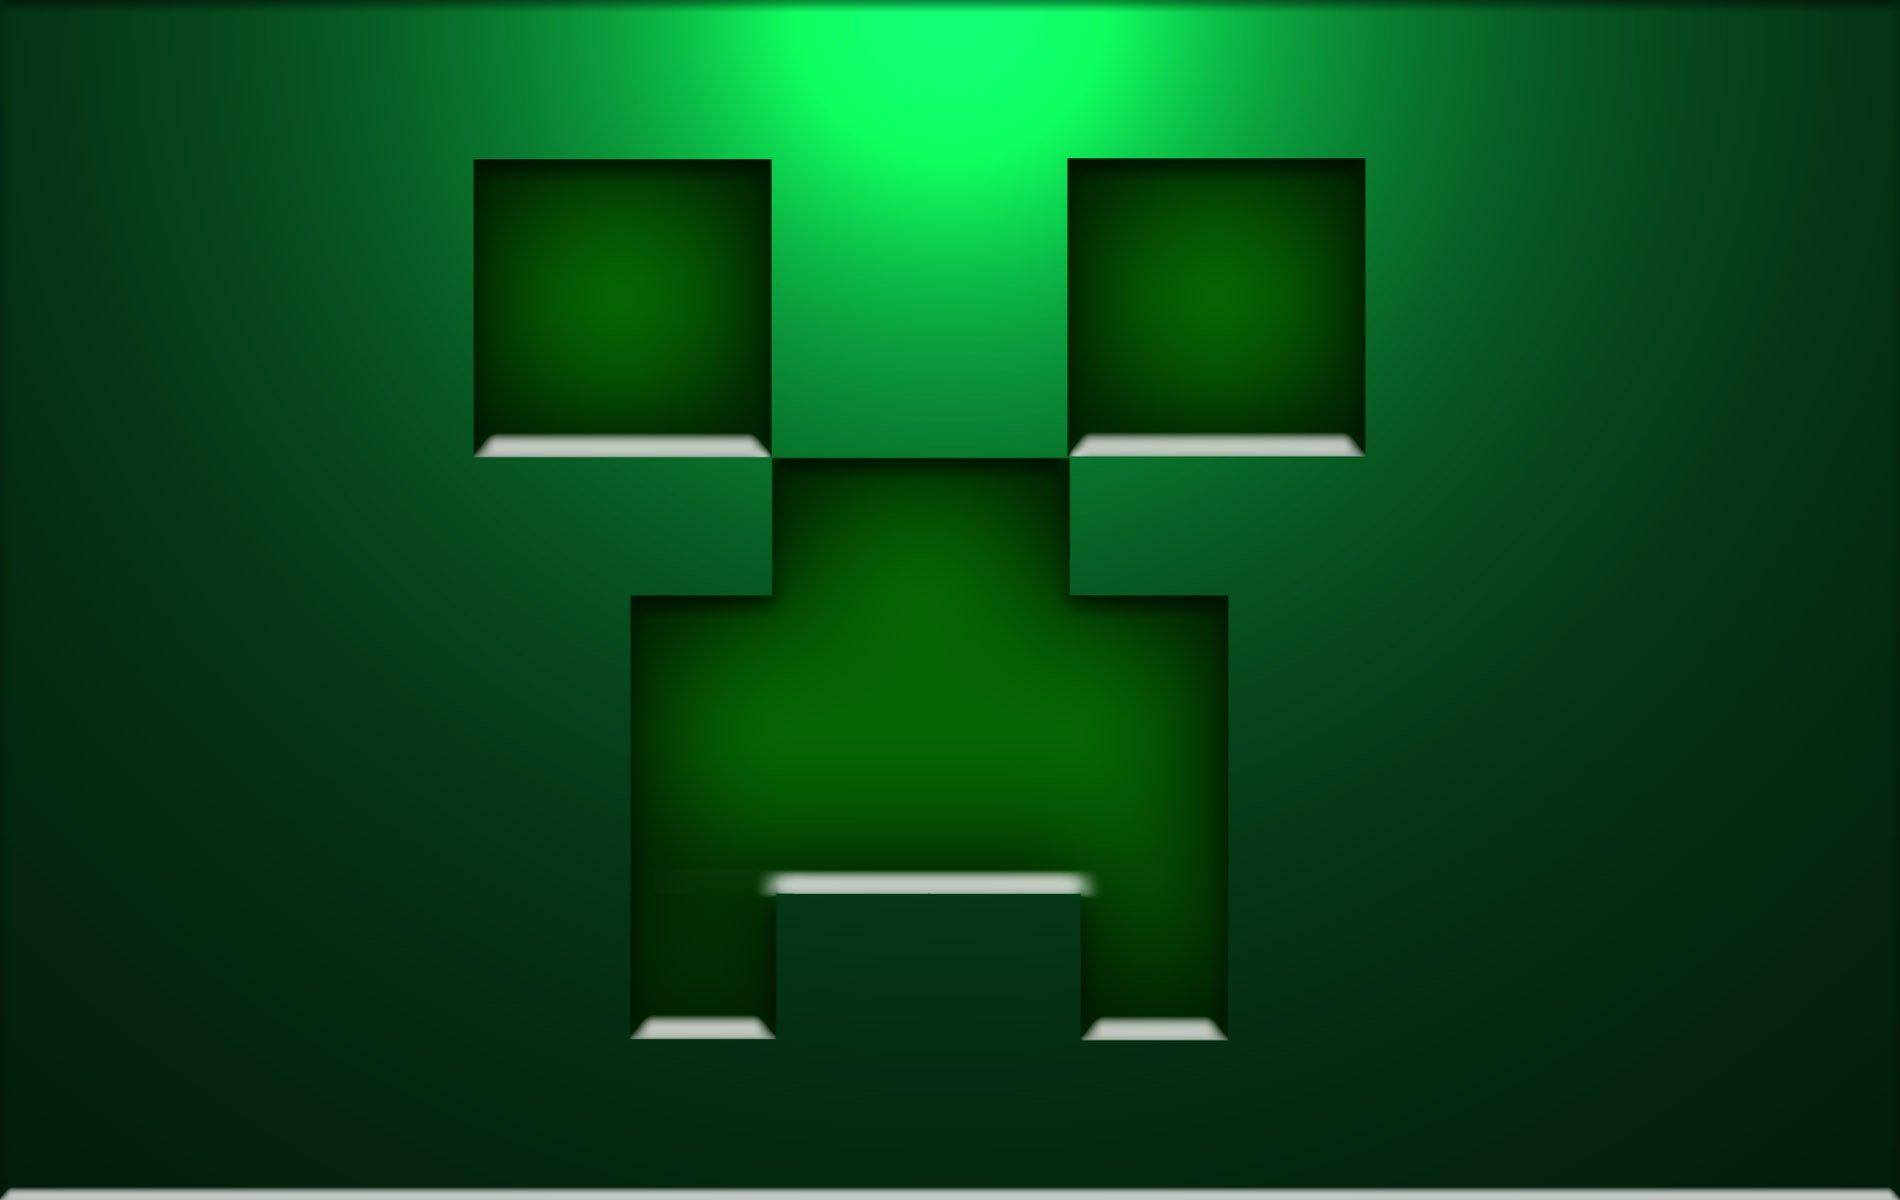 Creeper Minecraft Wallpapers 3D HD Wallpaper of Minecraft 1900x1200